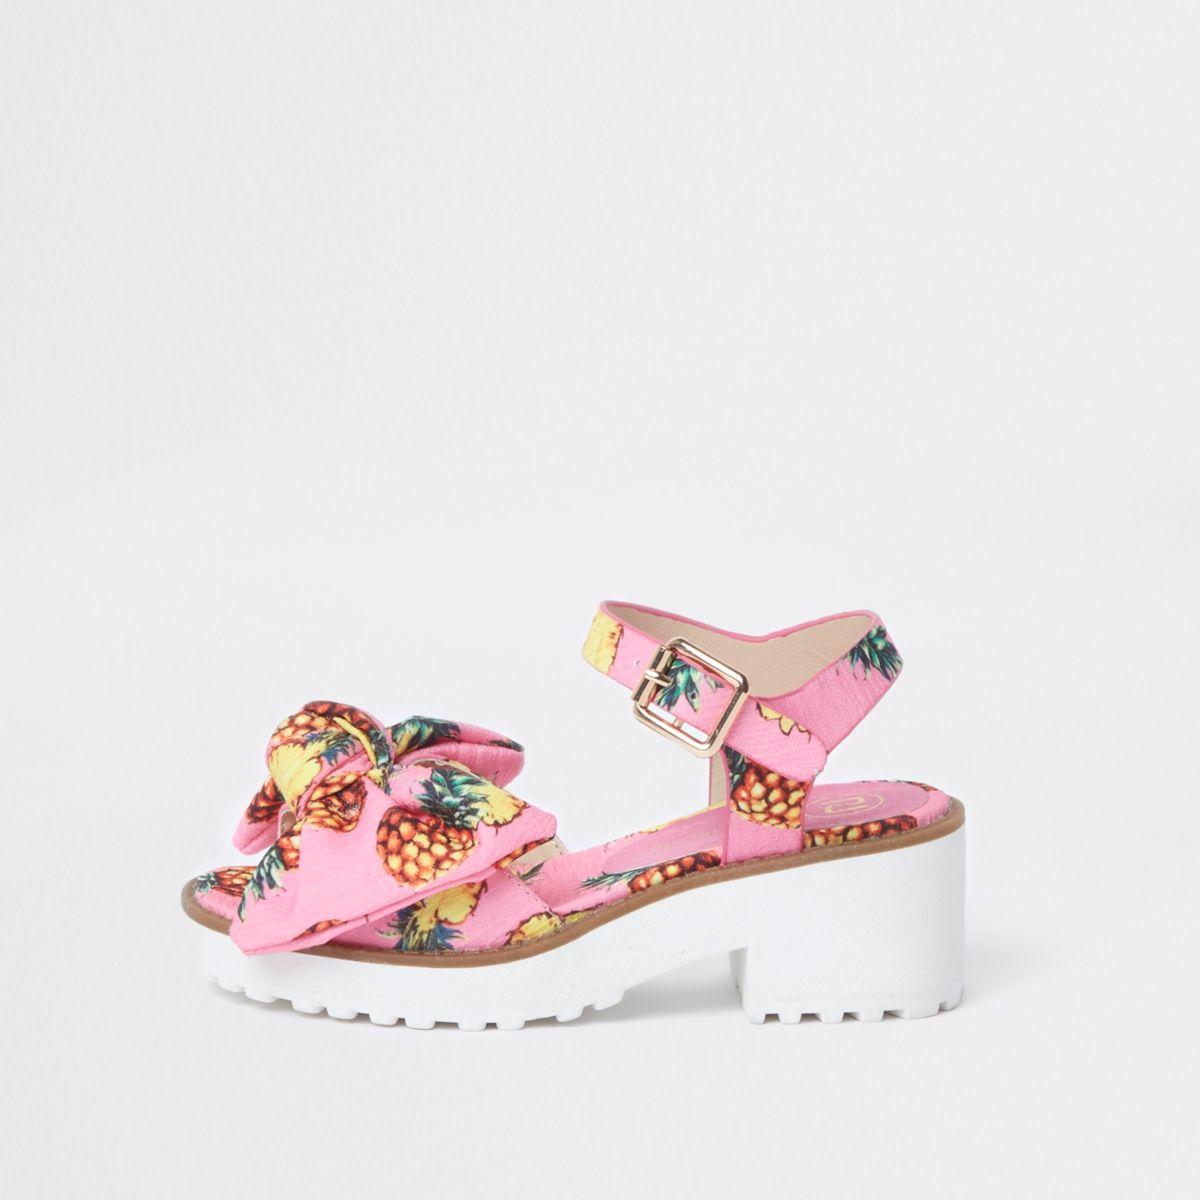 Girls pink pineapple clumpy sandal